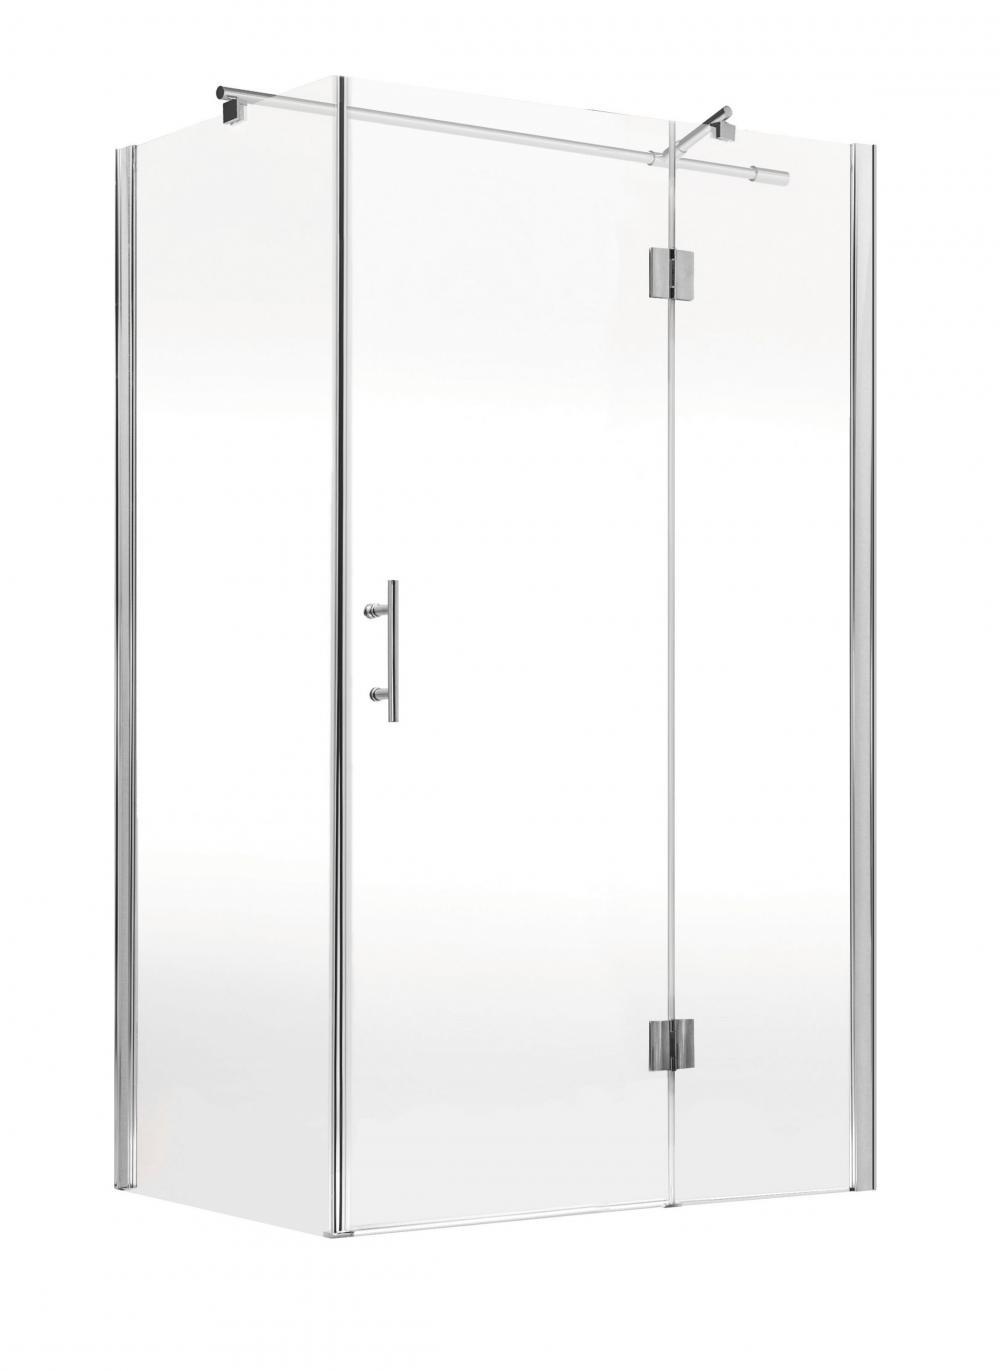 Deante Abelia szögletes zuhanykabin 120x90 cm